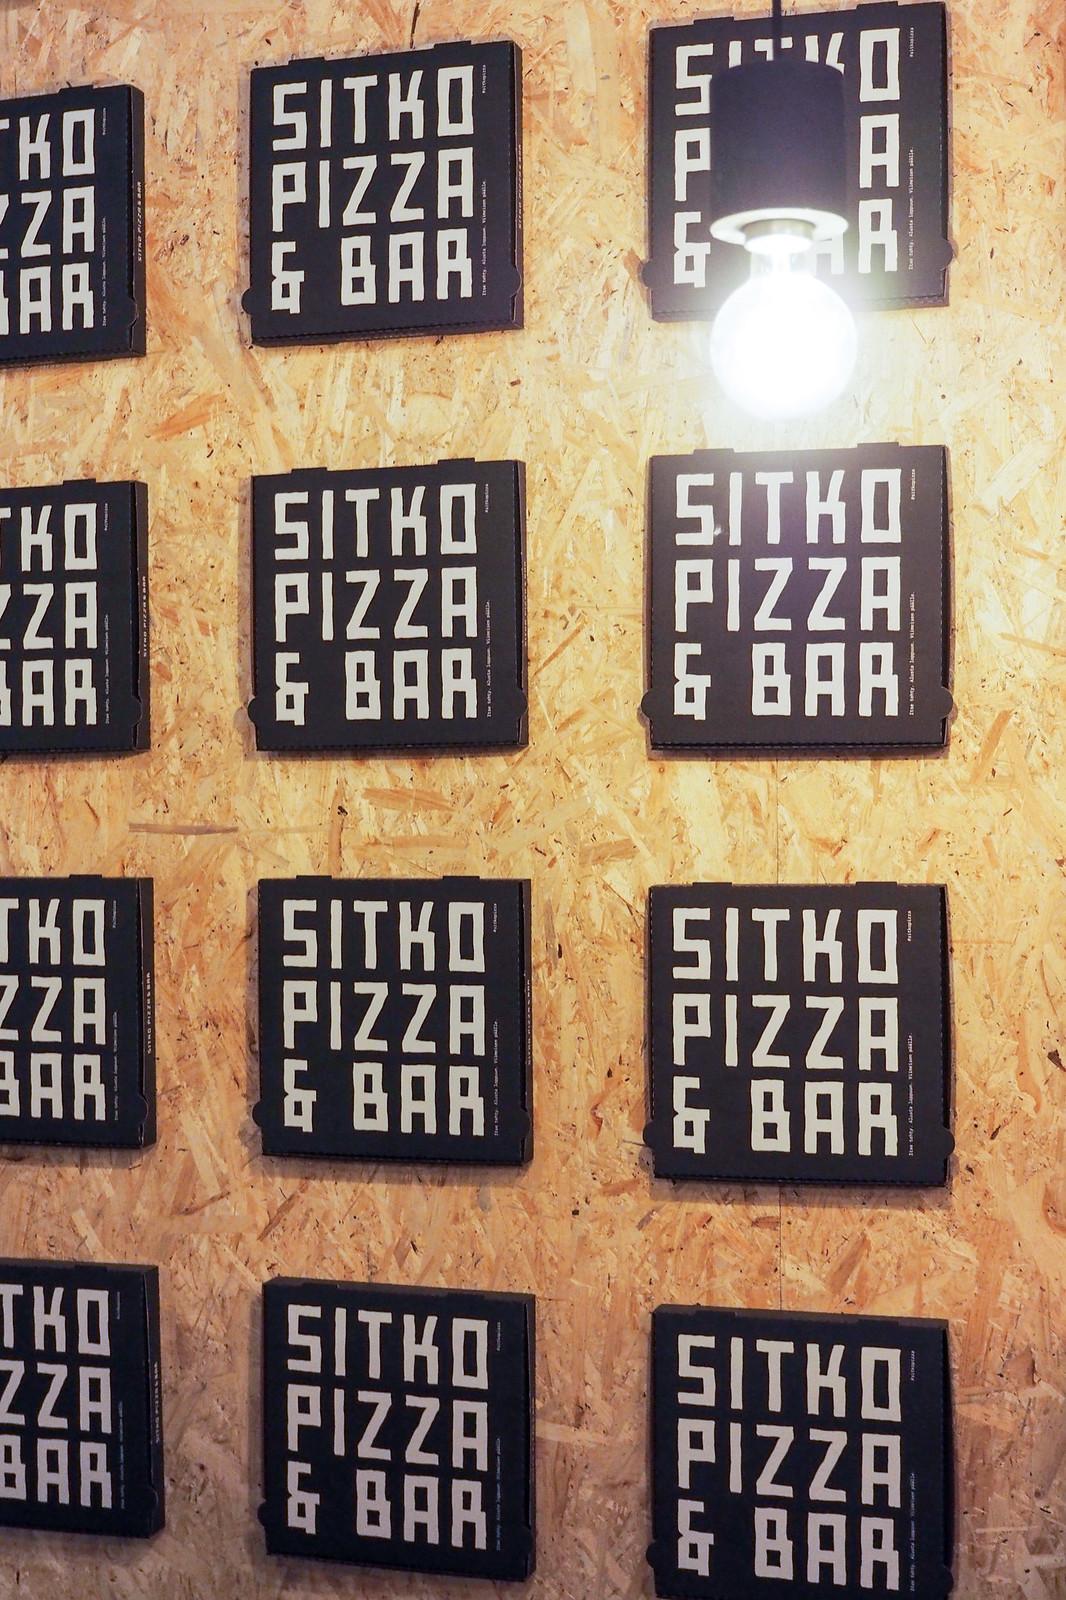 Sitko pizza & bar Tampere